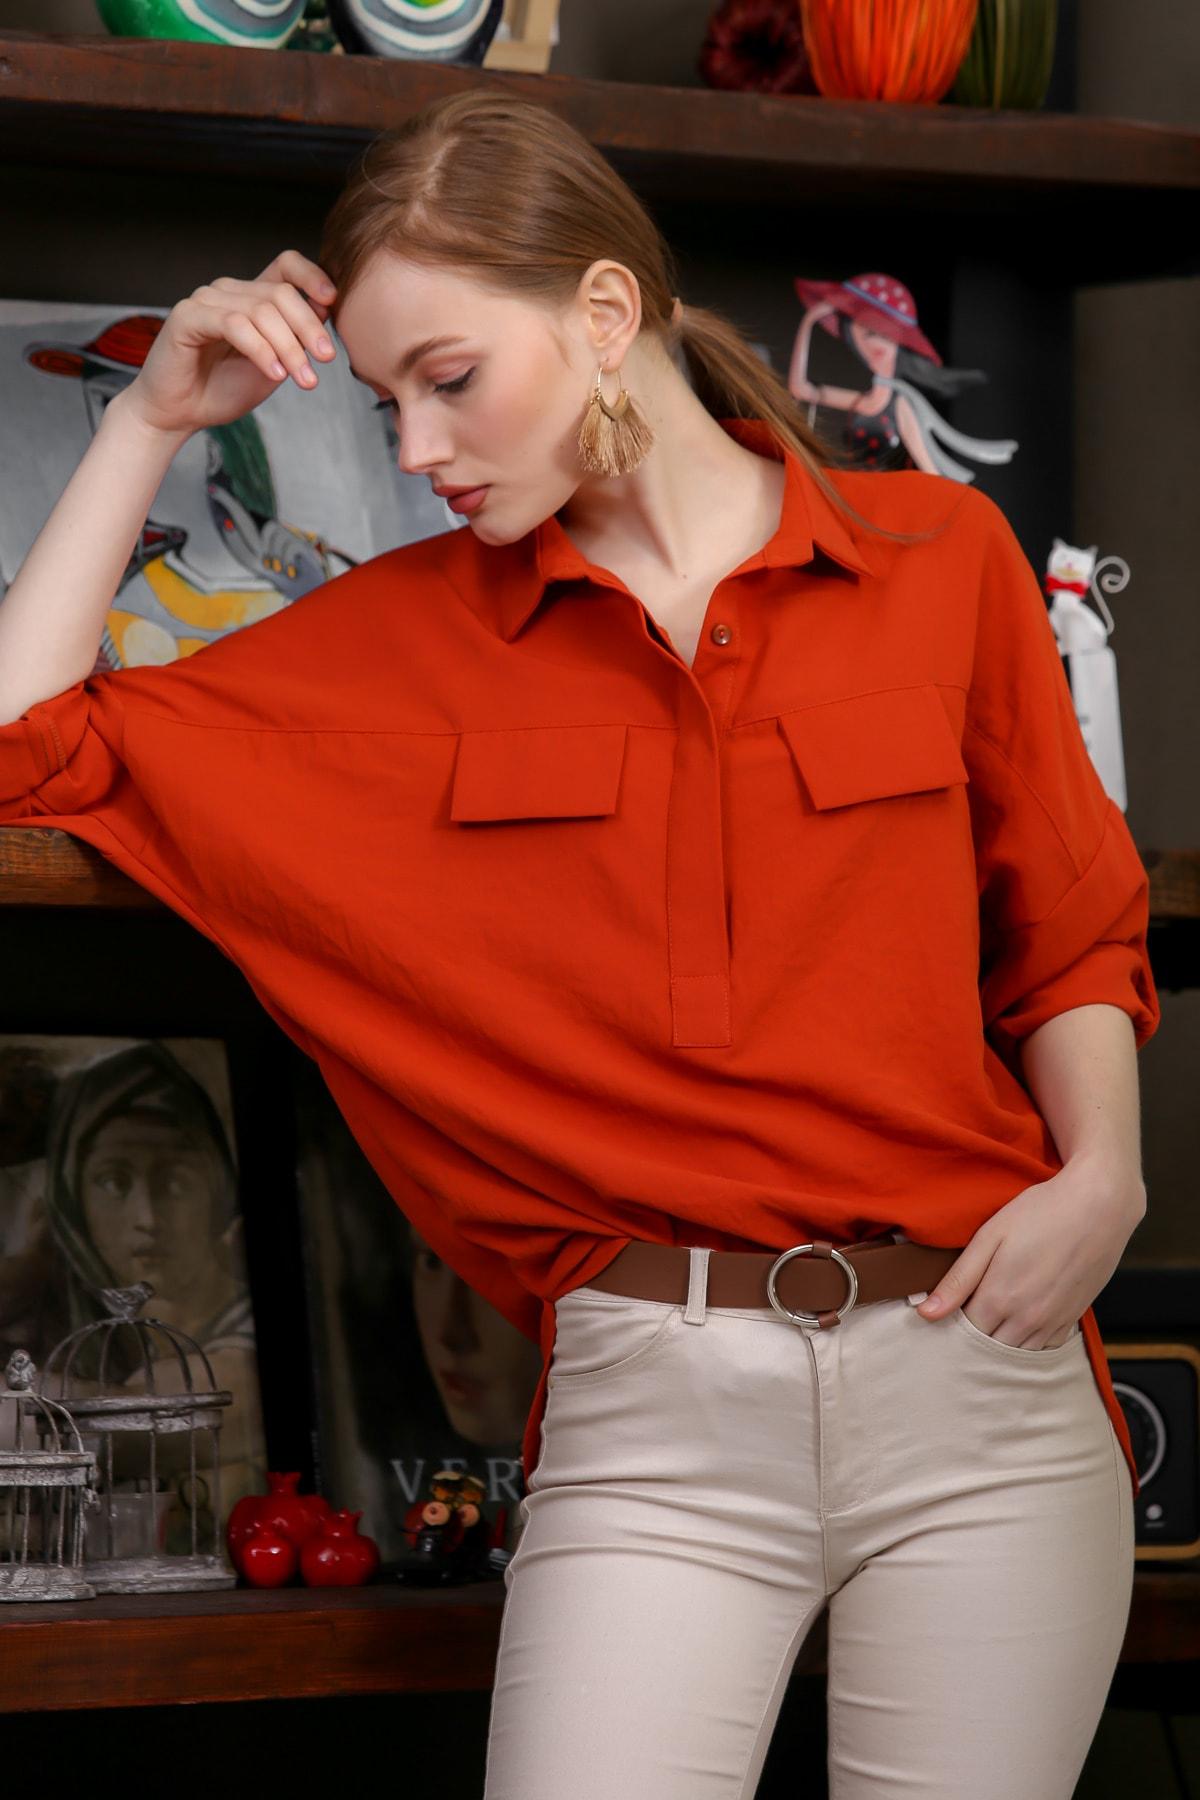 Chiccy Kadın Kiremit Gömlek Yaka Cep Kapaklı Kol Ayarlı Patı Düğmeli Bluz M10010200BL95462